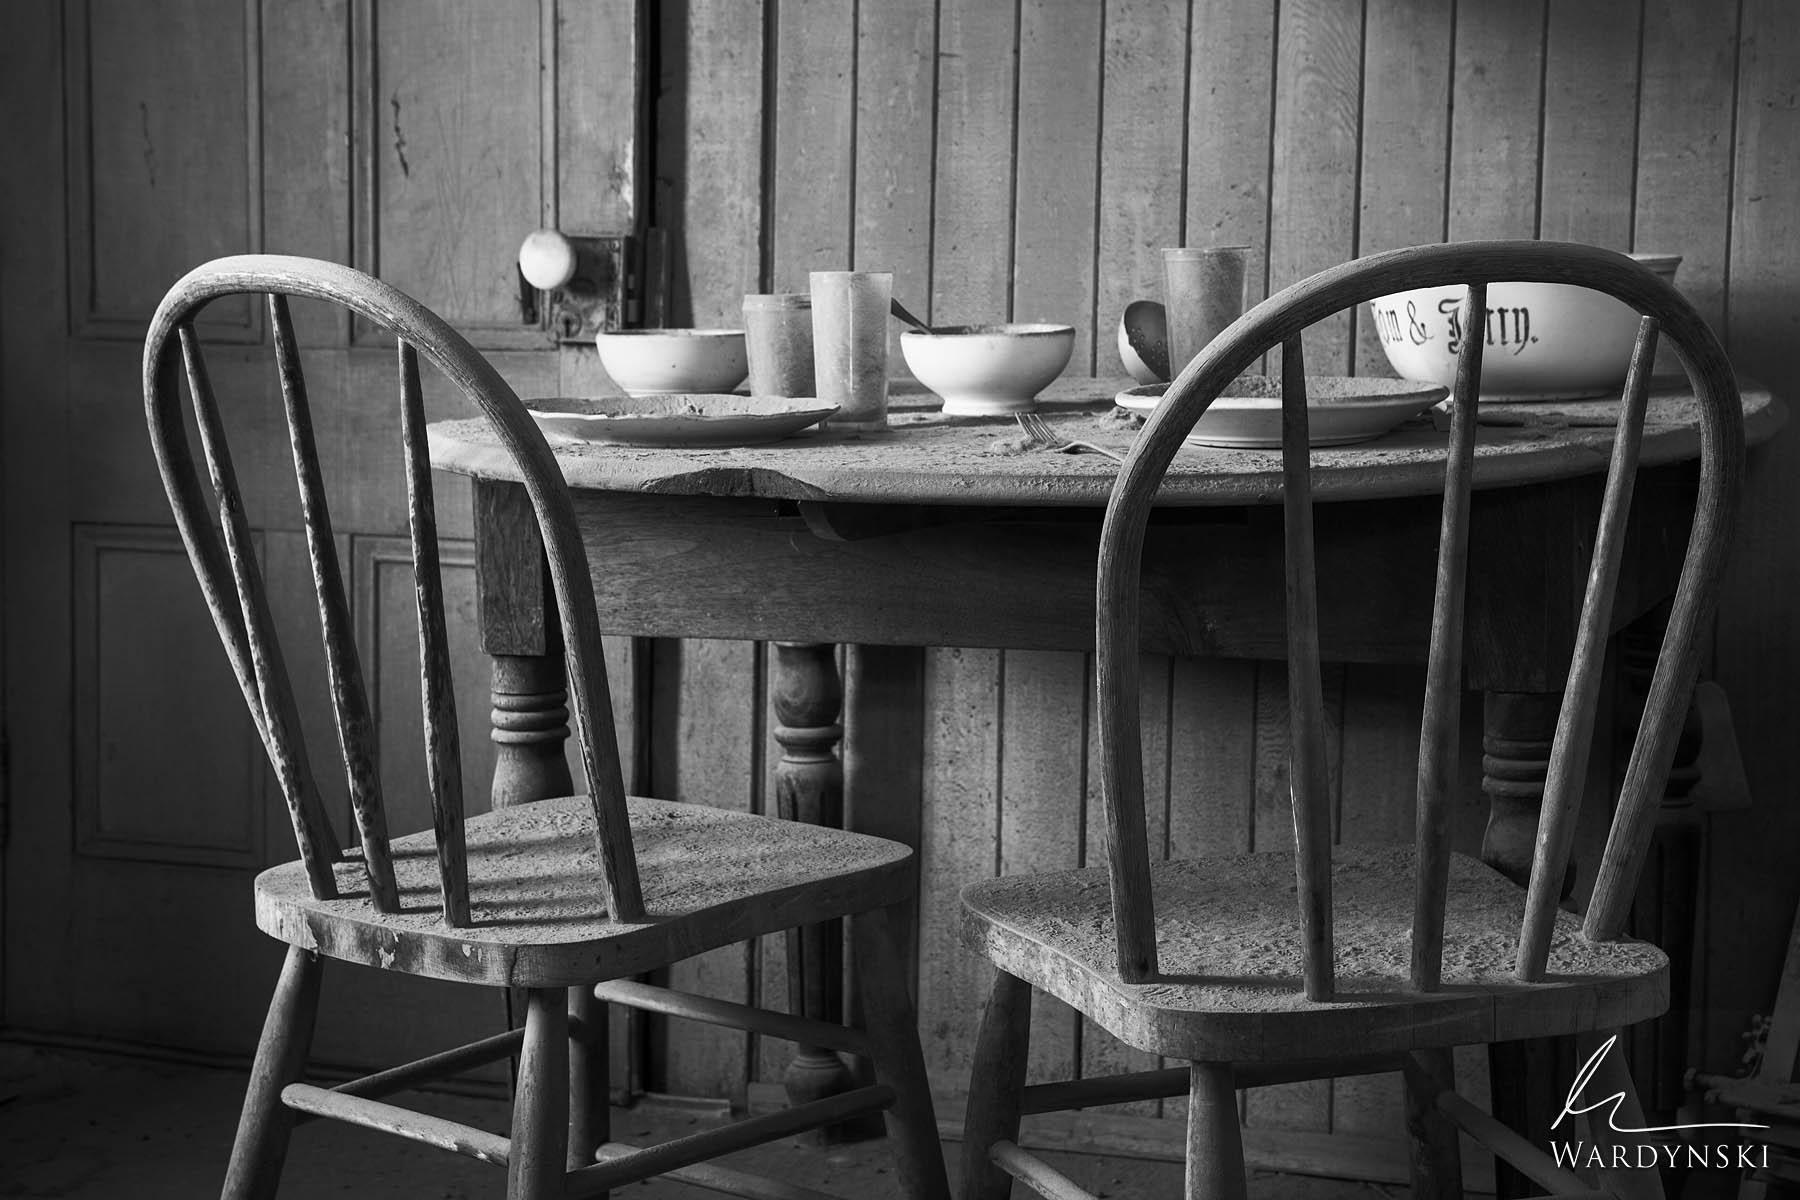 horizontal, black and white, b&w, monochrome